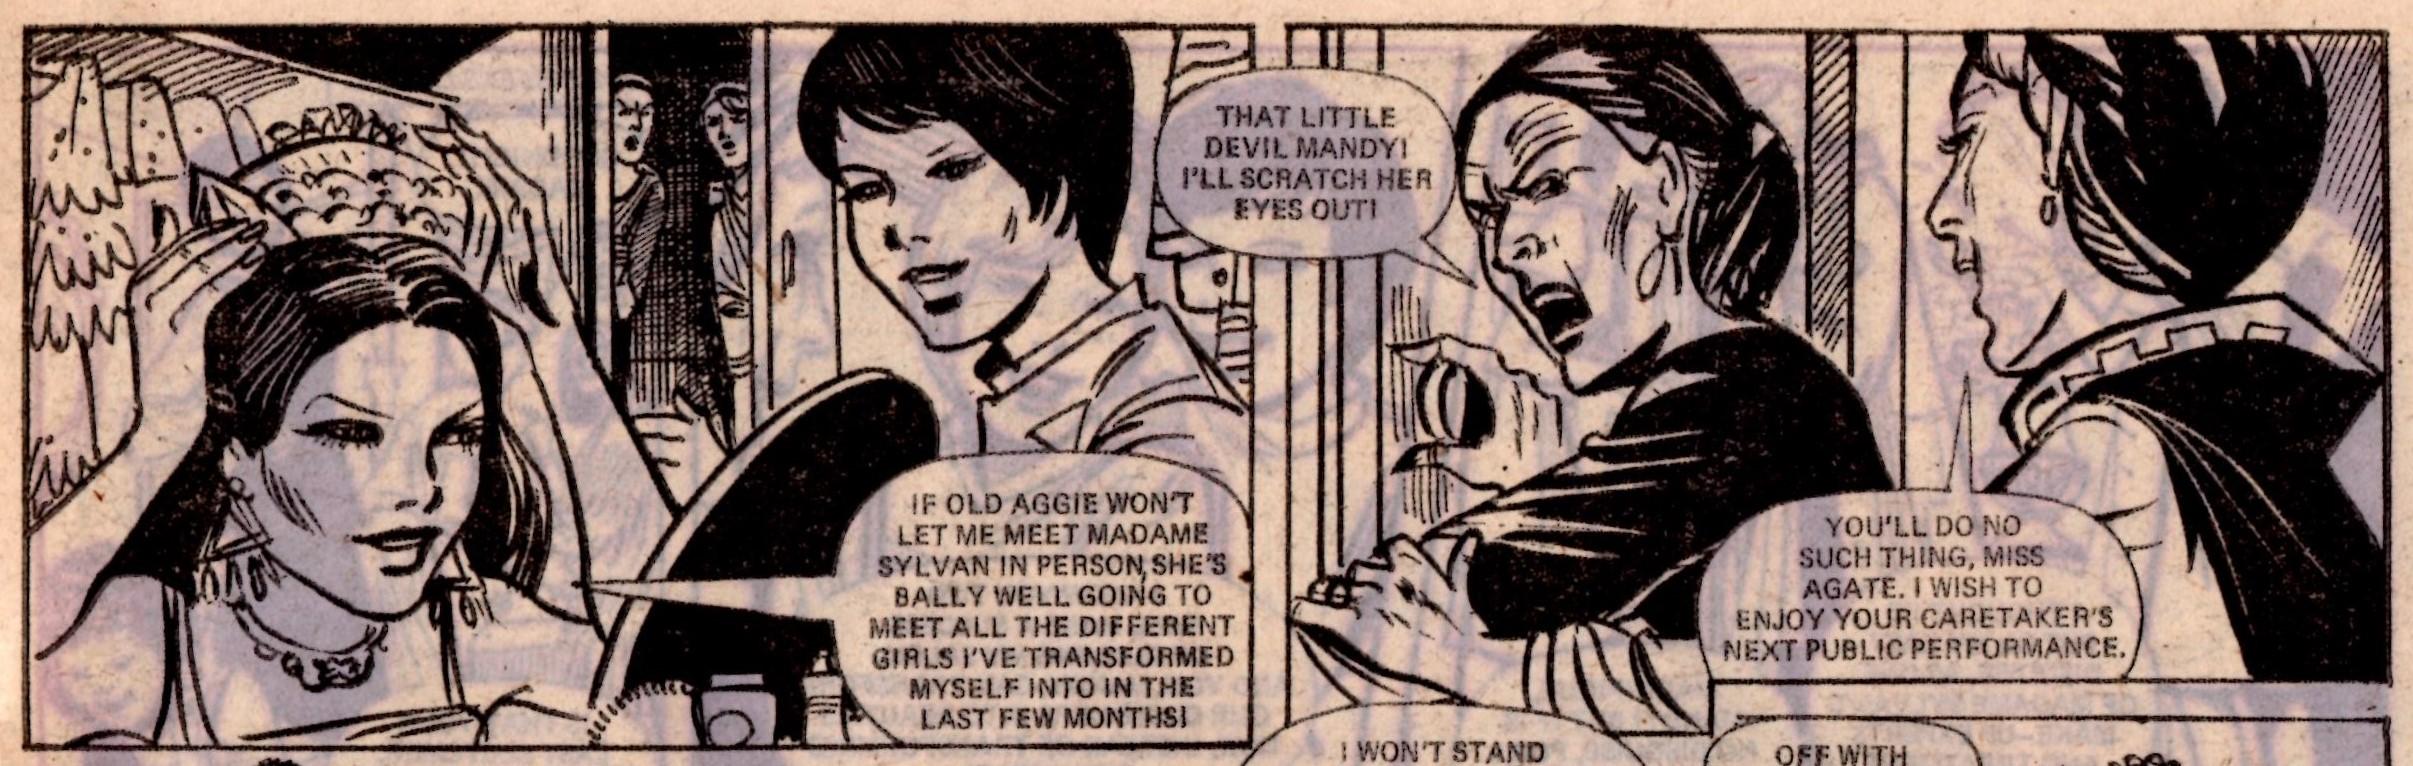 Made-up Mandy: Audrey Fawley (artist)